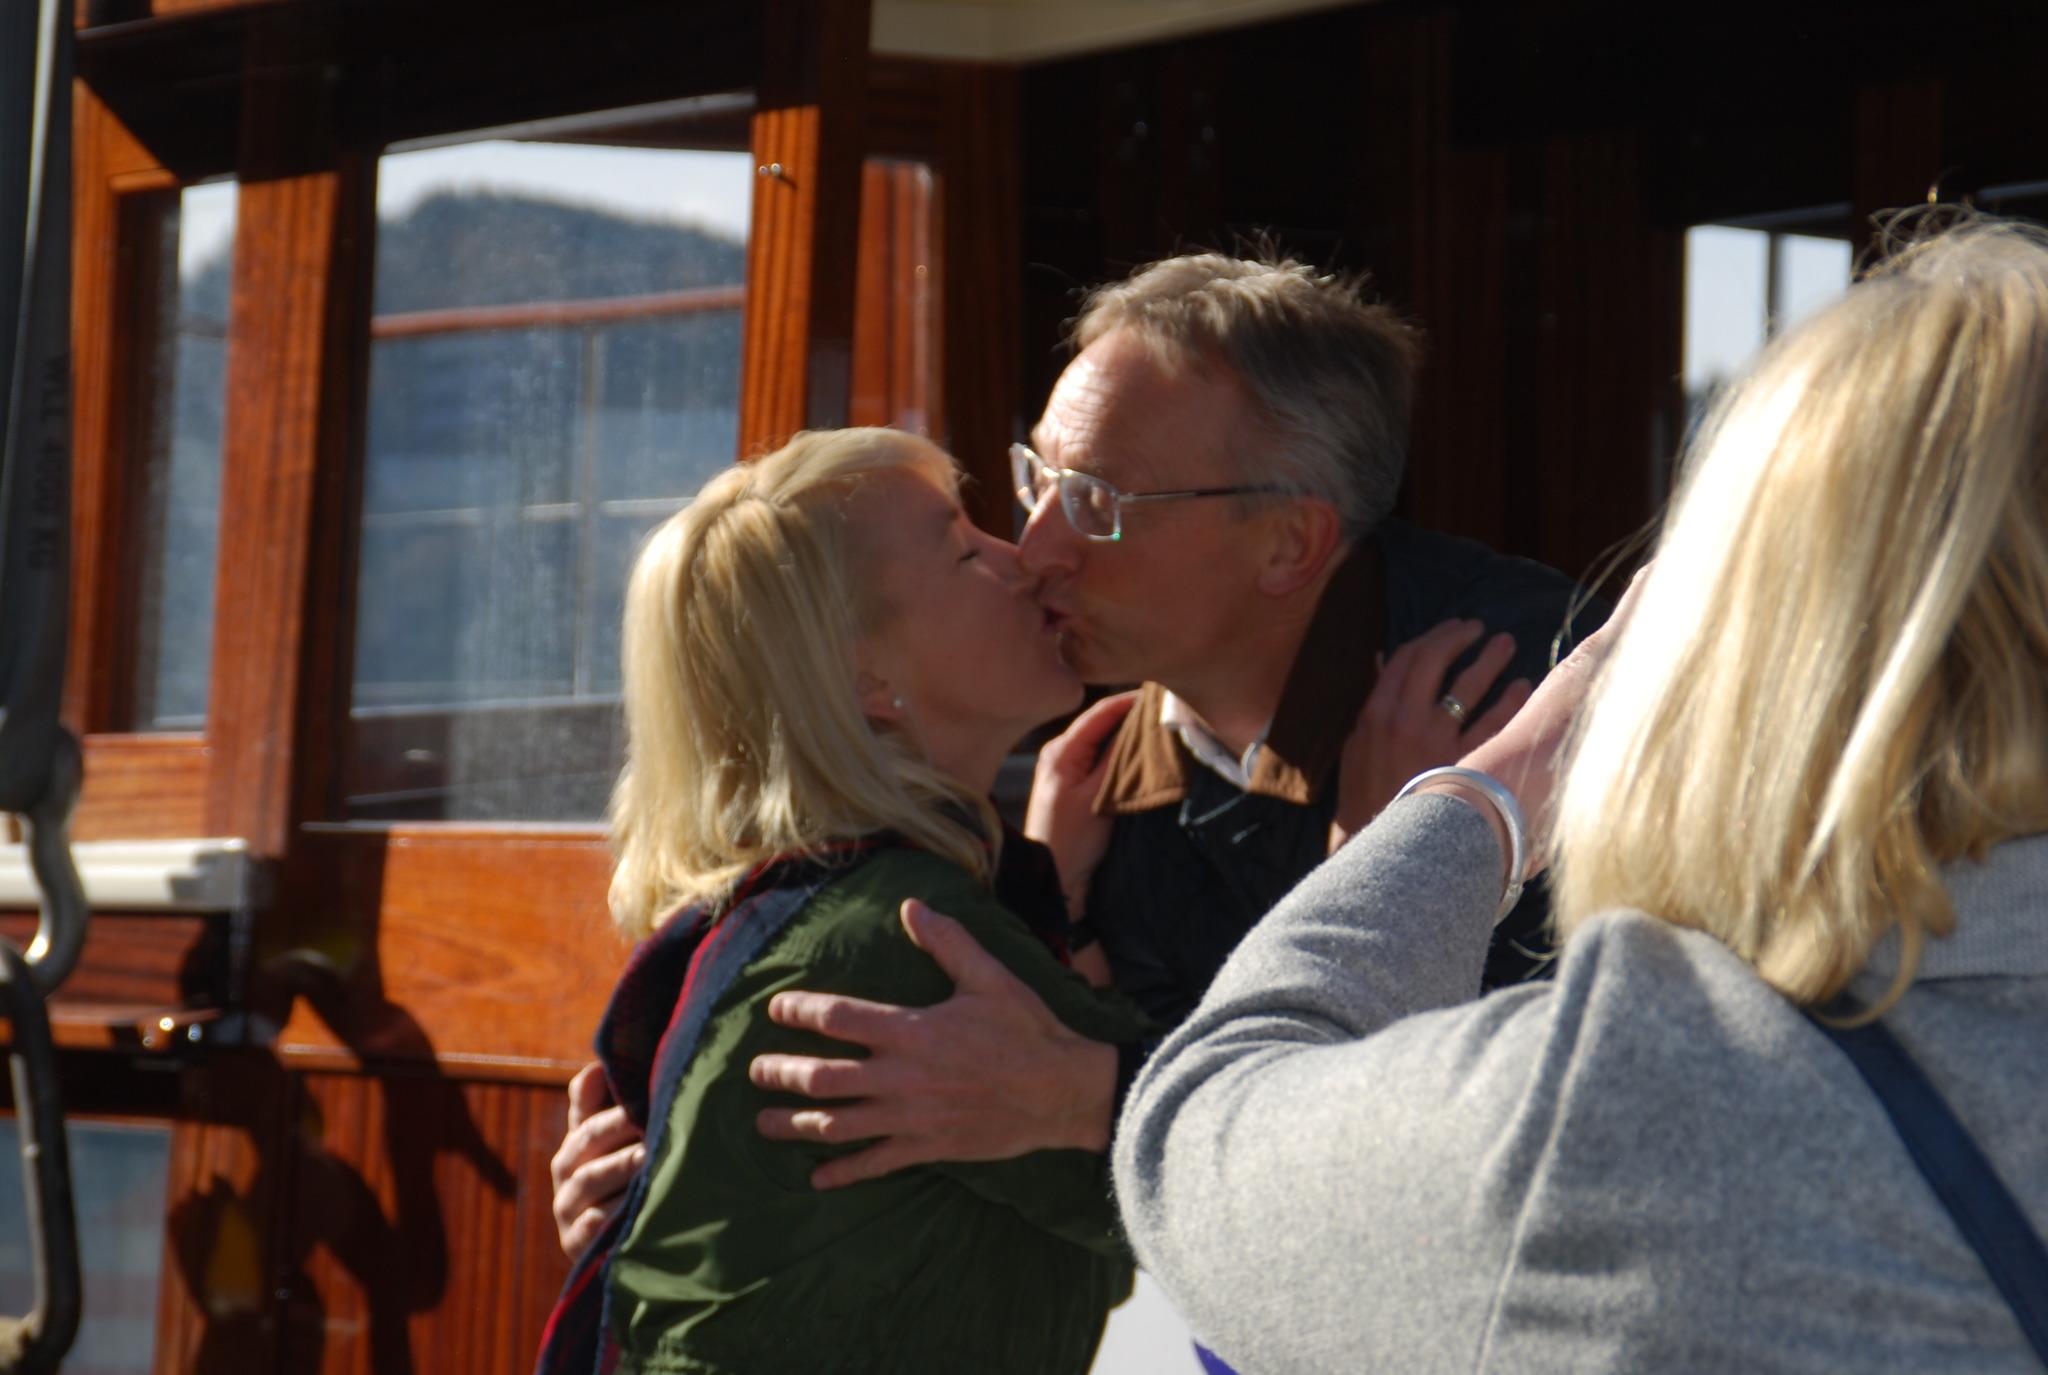 Flirt & Abenteuer Seeboden | Locanto Casual Dating